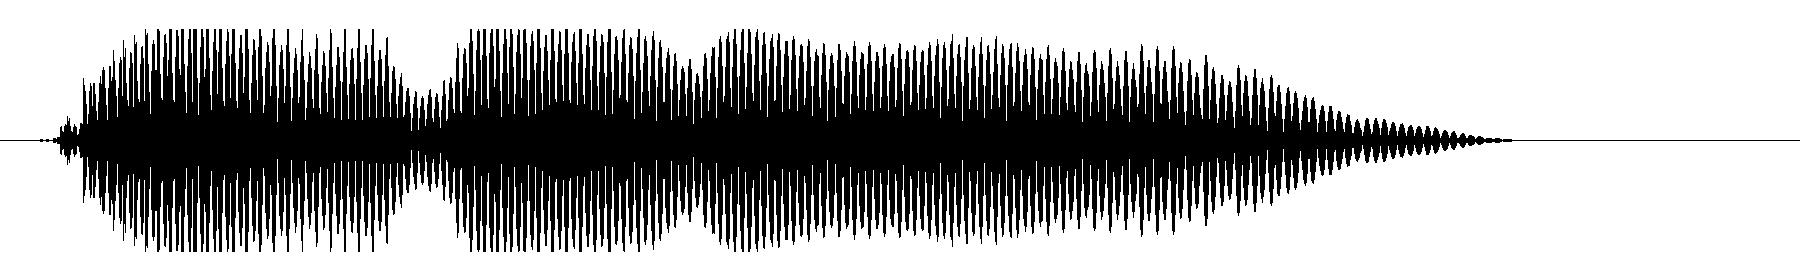 alvinbary 04